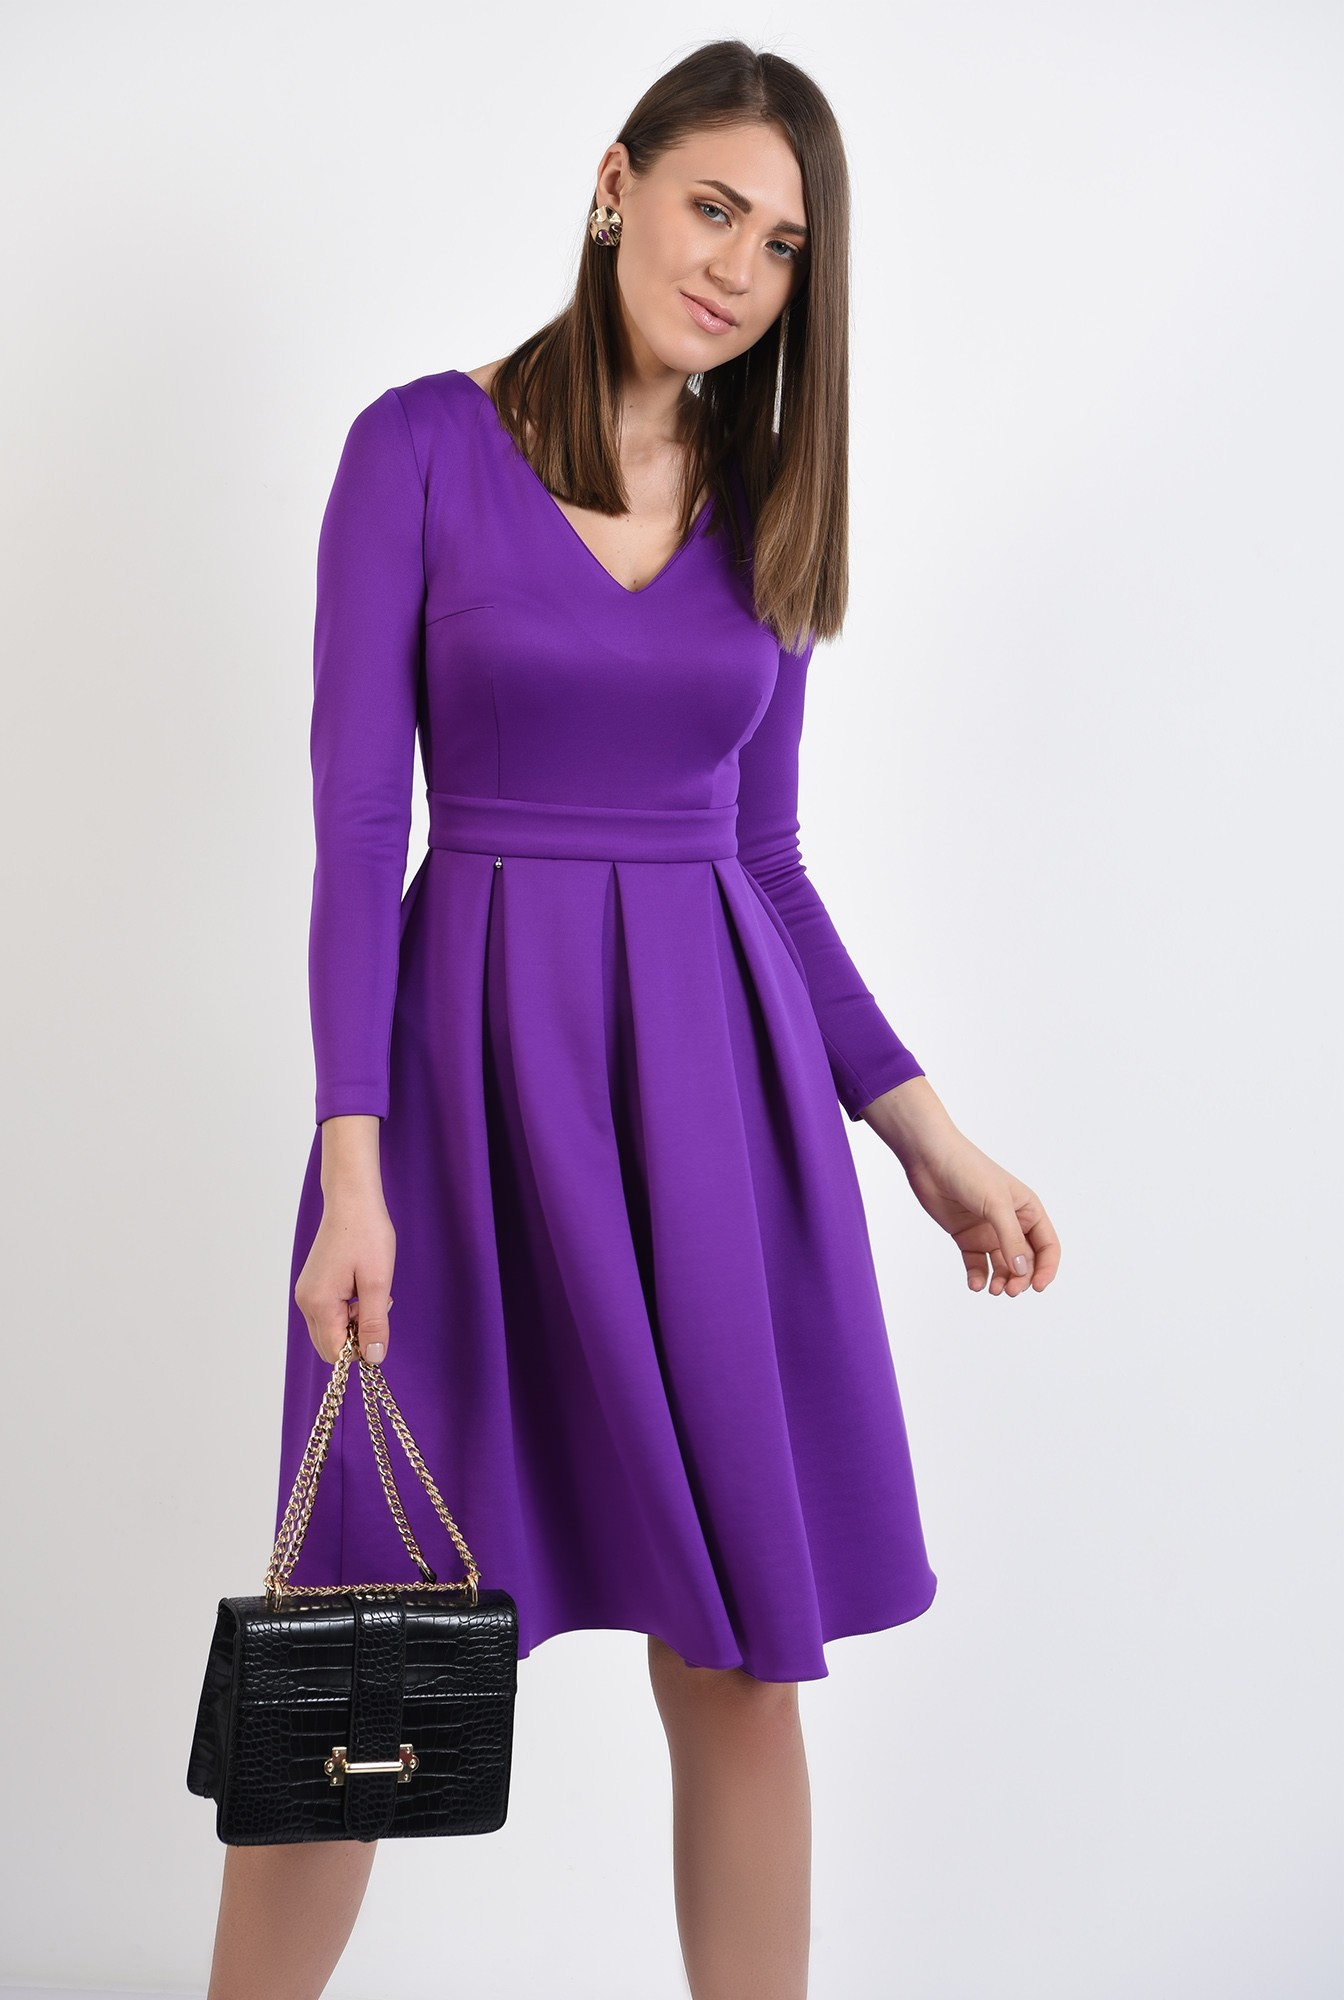 rochie eleganta, evazata, mov, cu pliuri late, maneci stretch